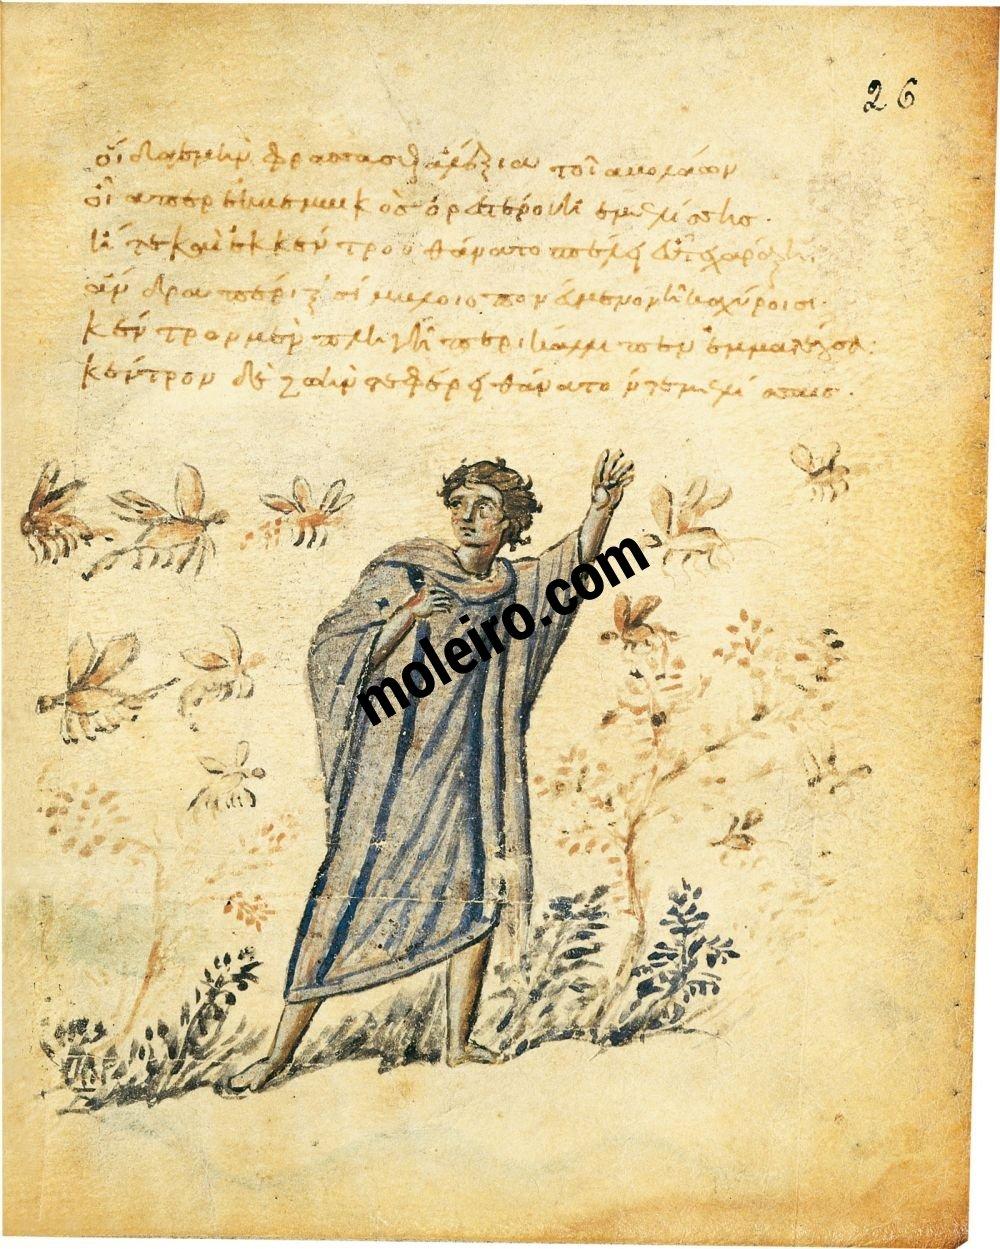 Theriaka und Alexipharmaka f. 26r